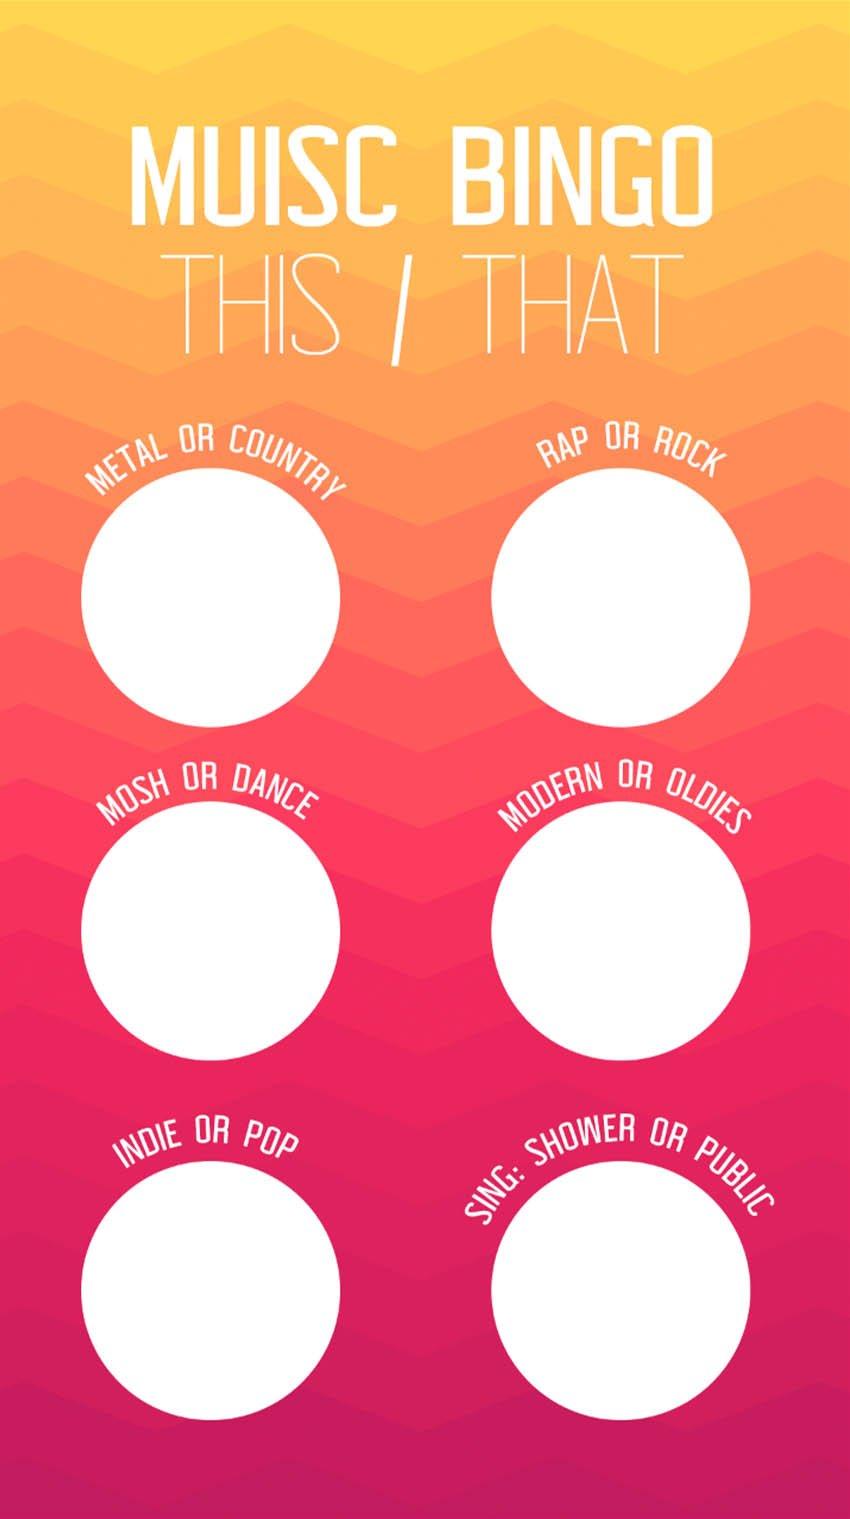 duplicate circles and text